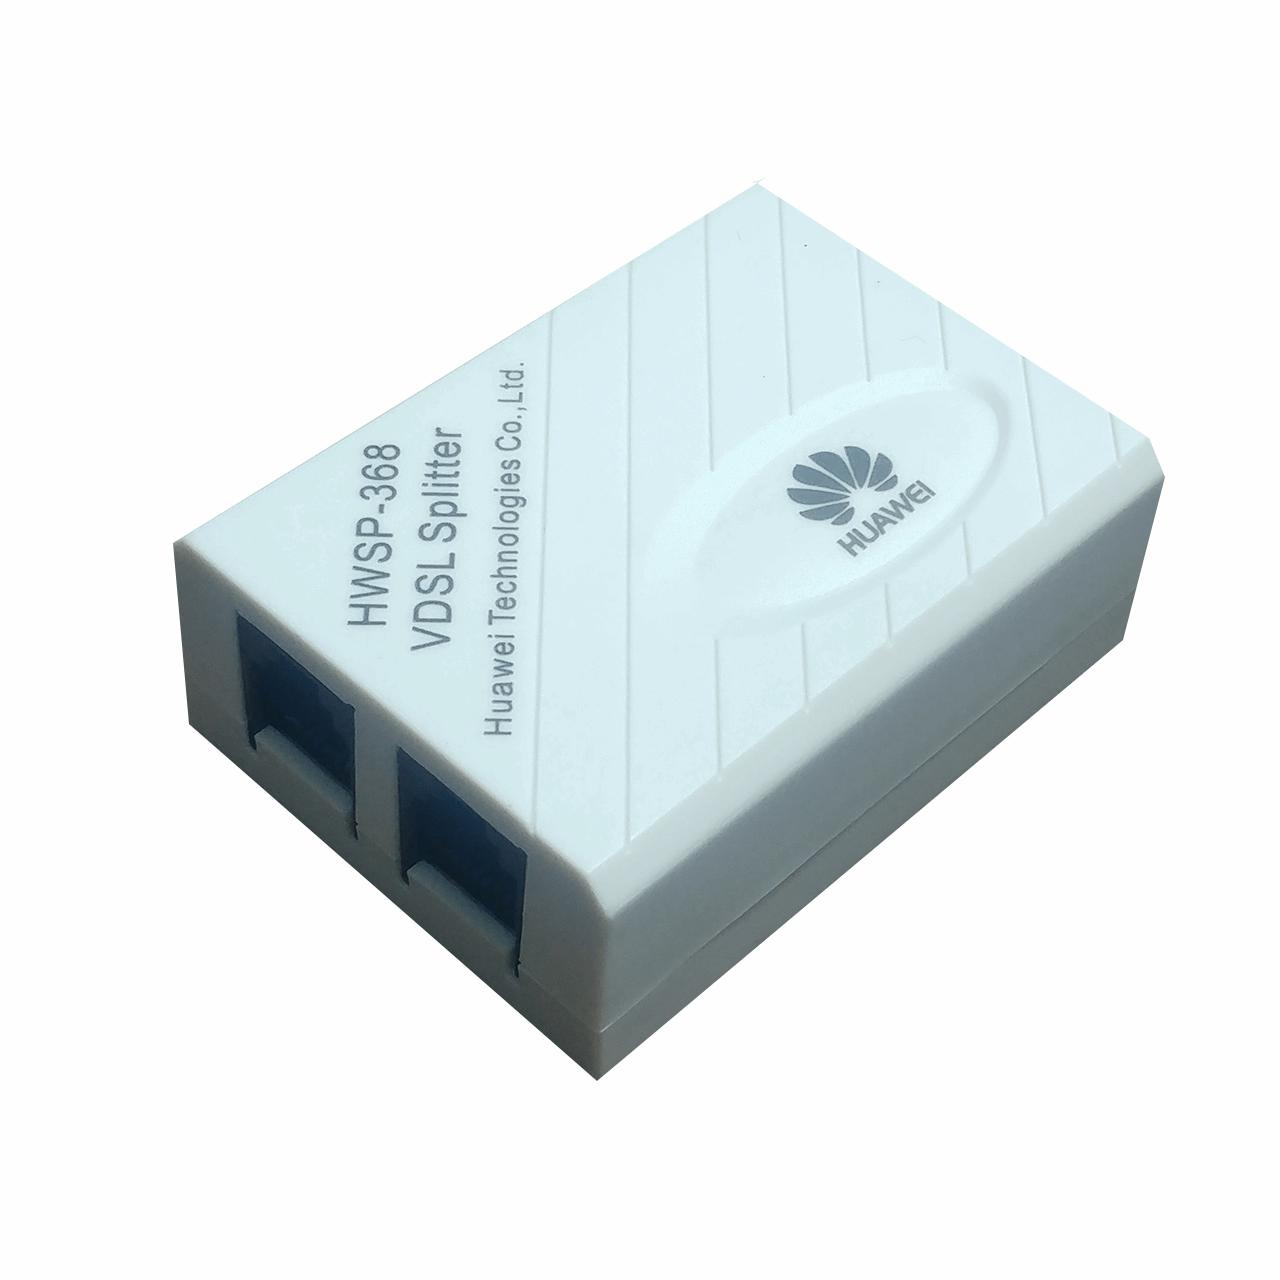 اسپلیتر هوآوی مدل HWSP-368 بسته 70 عددی